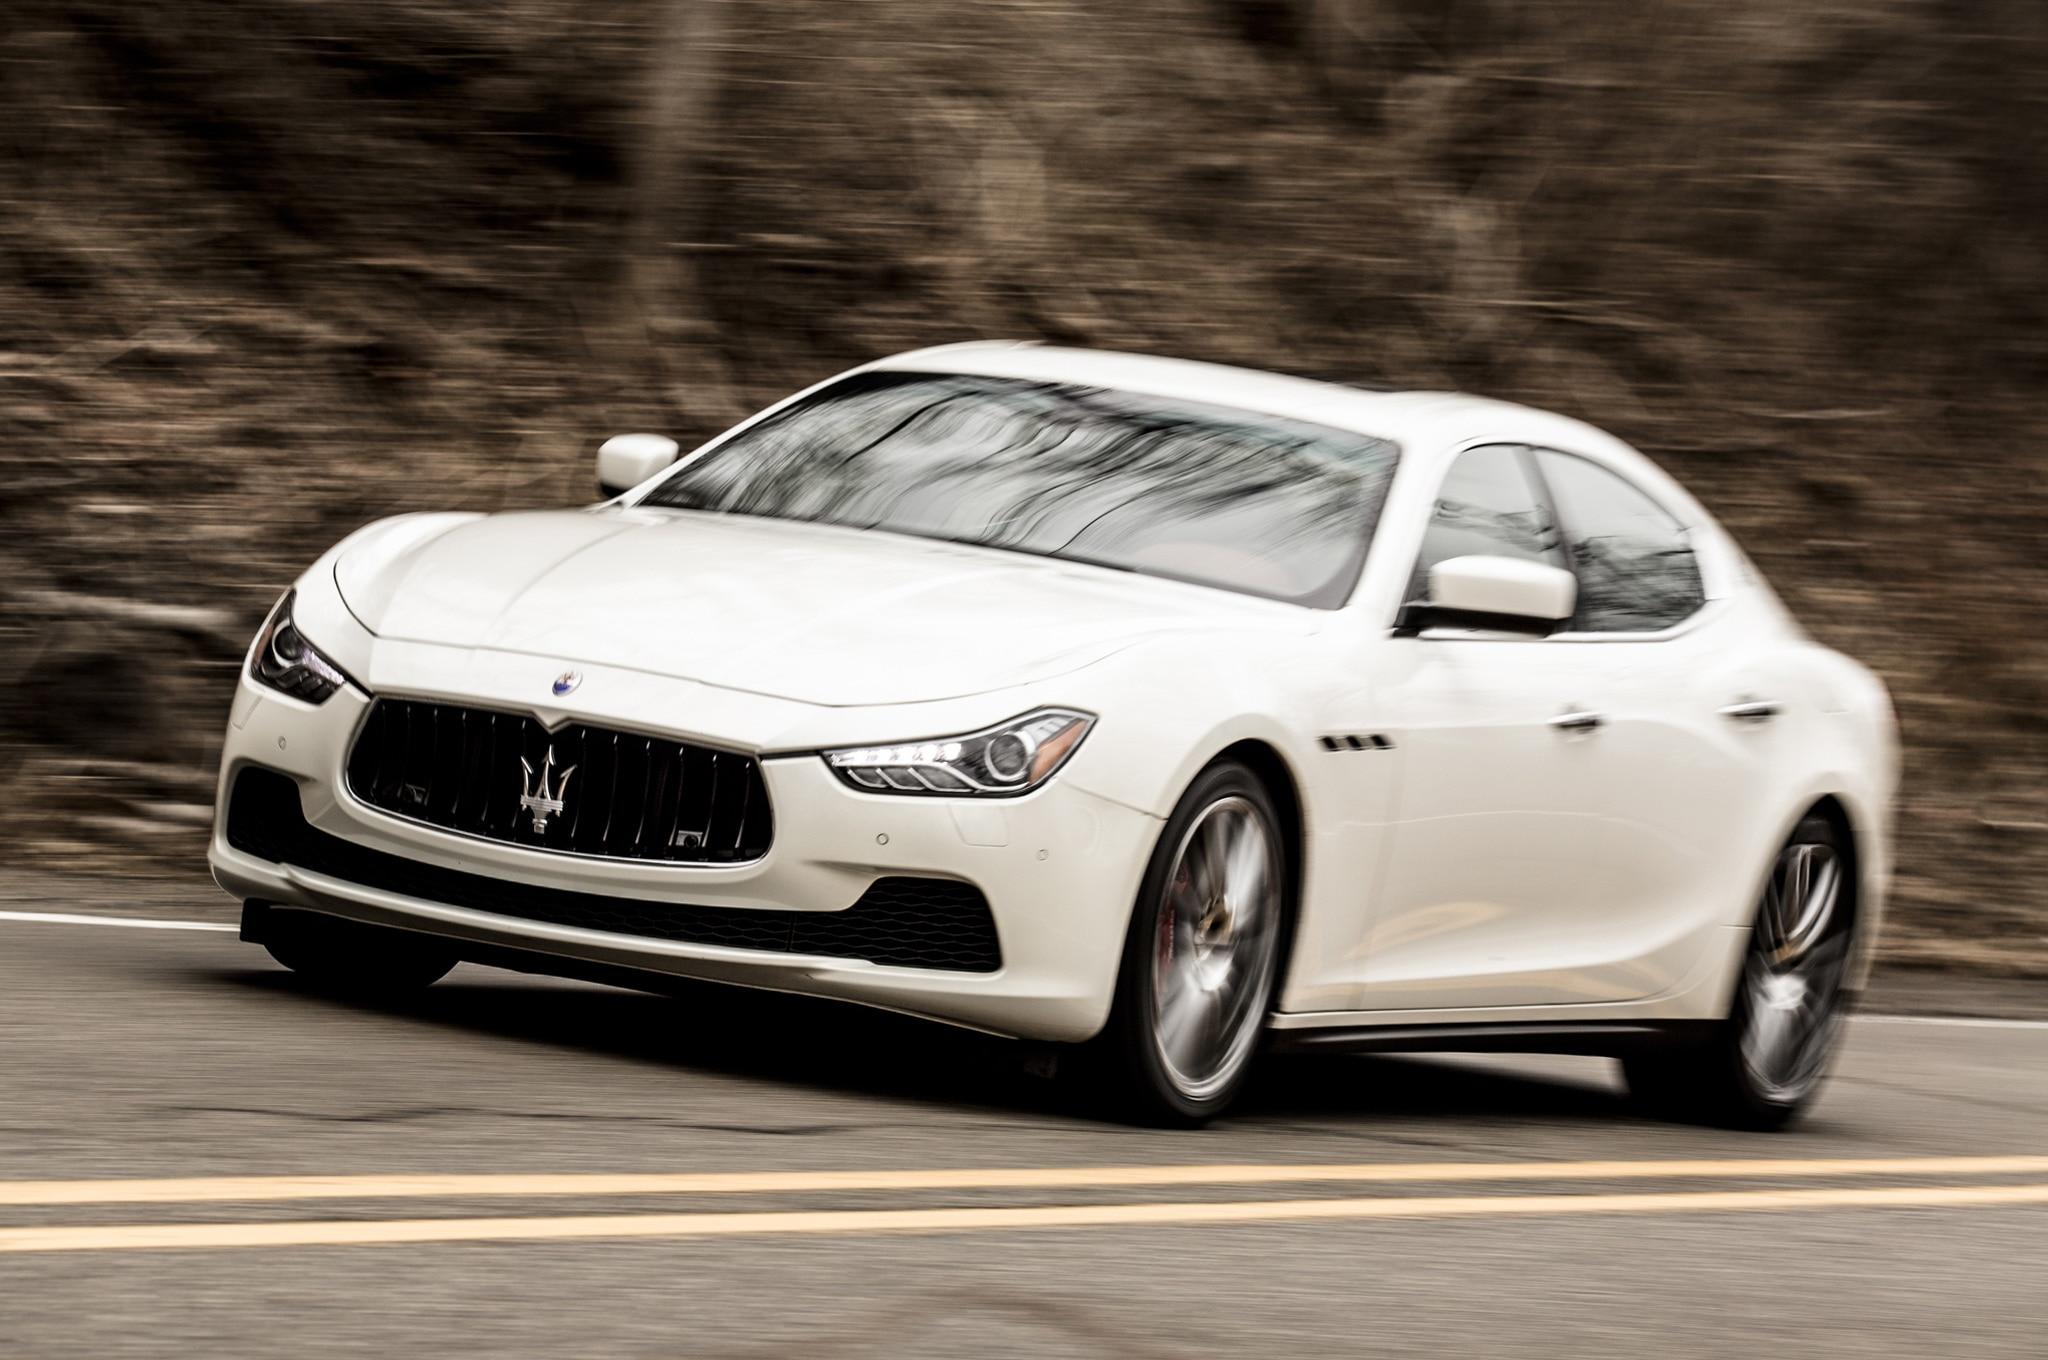 2014 Maserati Ghibli S Q4 In Motion